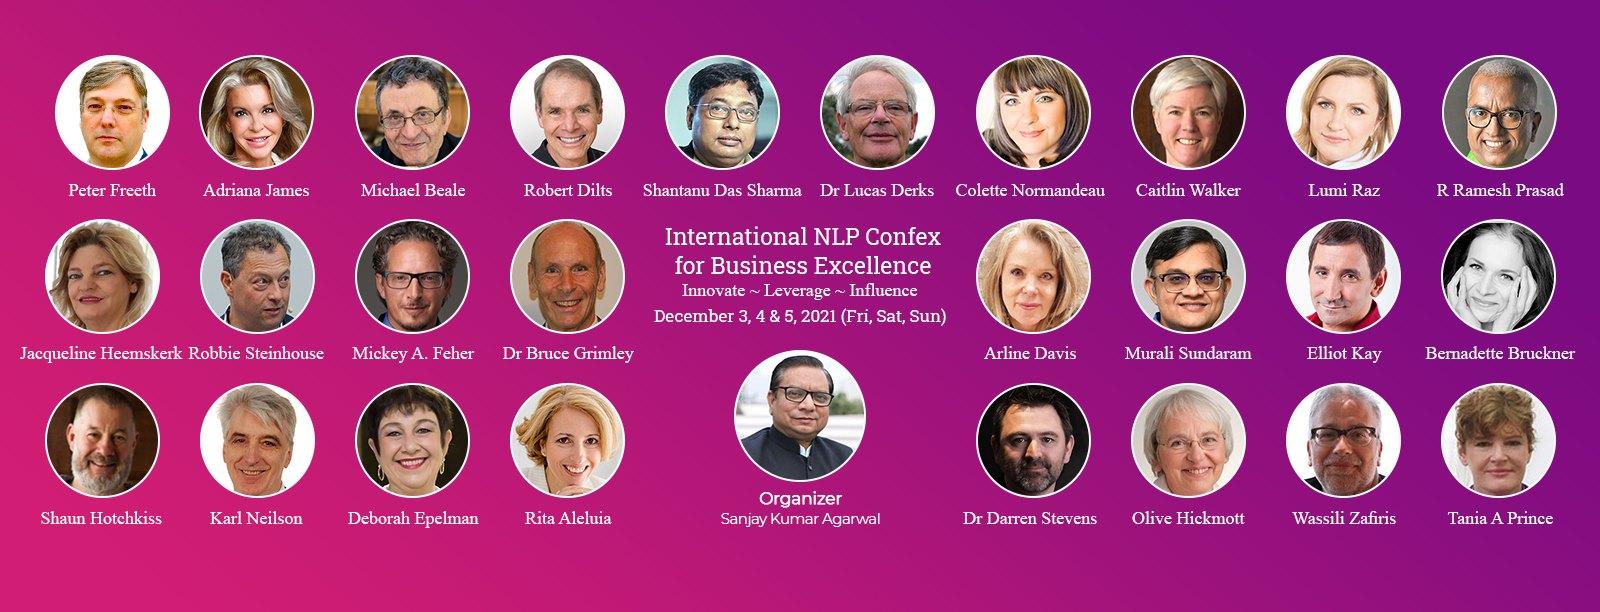 Rita Aleluia, Robert Dilts, Adriana James, Lucas Derks, 27 PNL Master Trainers, oradores, International NLP Confex for Business Excellence